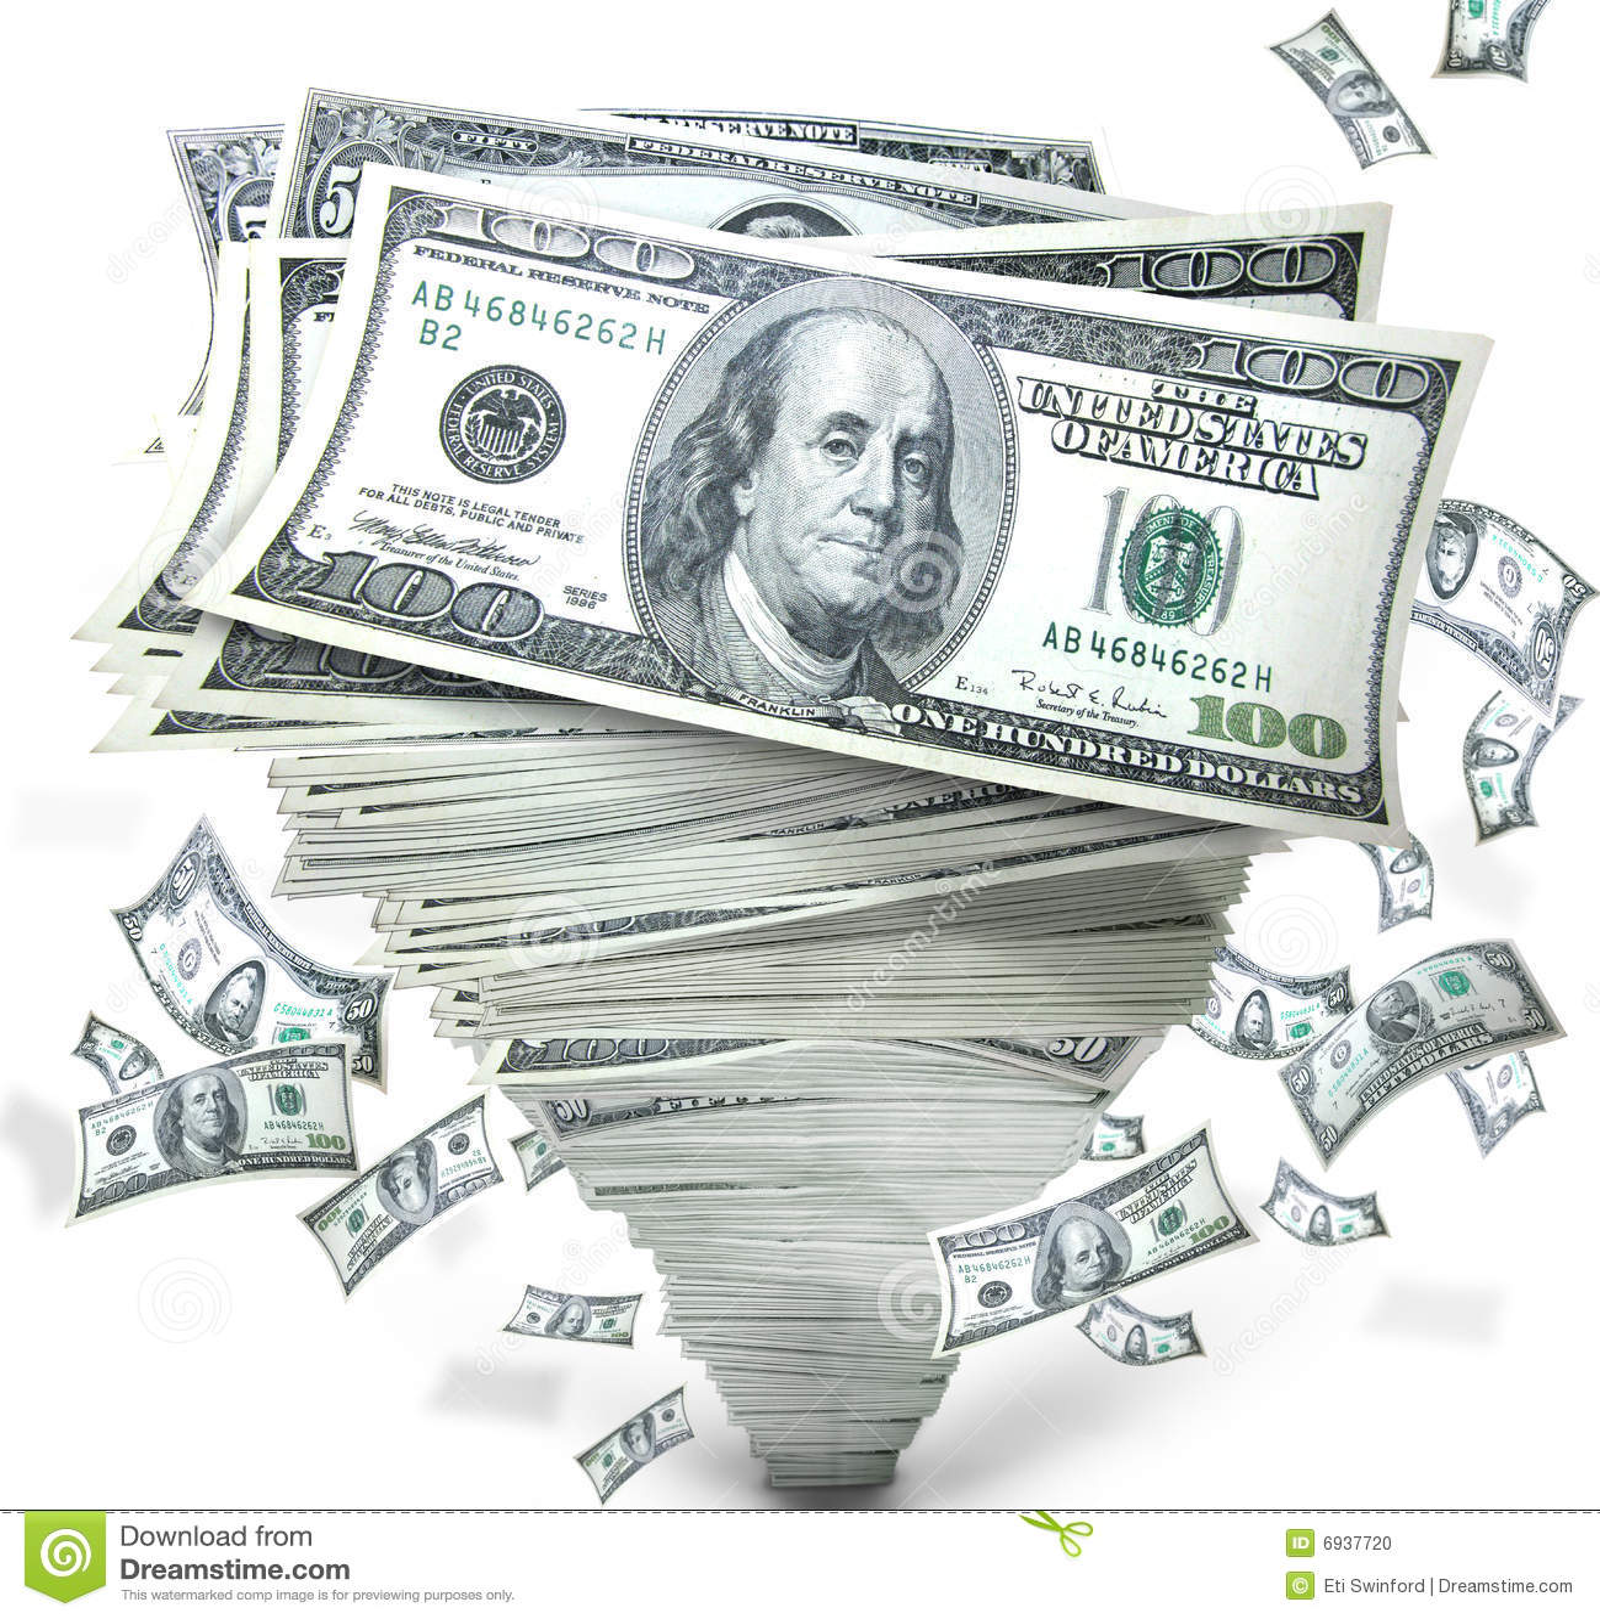 Money in stack of cash